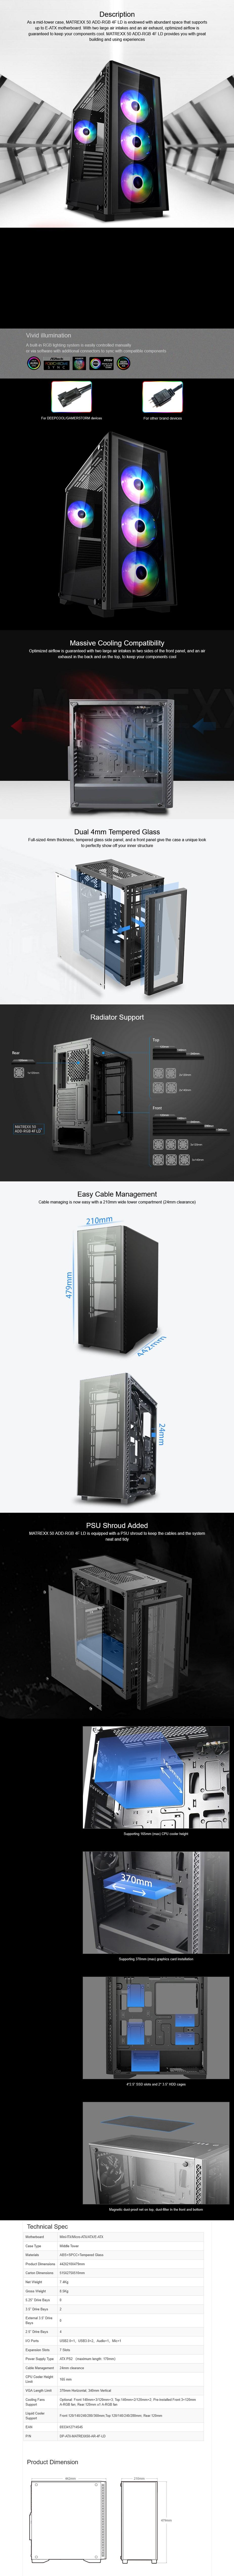 Deepcool Matrexx 50 ADD RGB 4F LD Tempered Glass Mid-Tower E-ATX Case - Overview 1